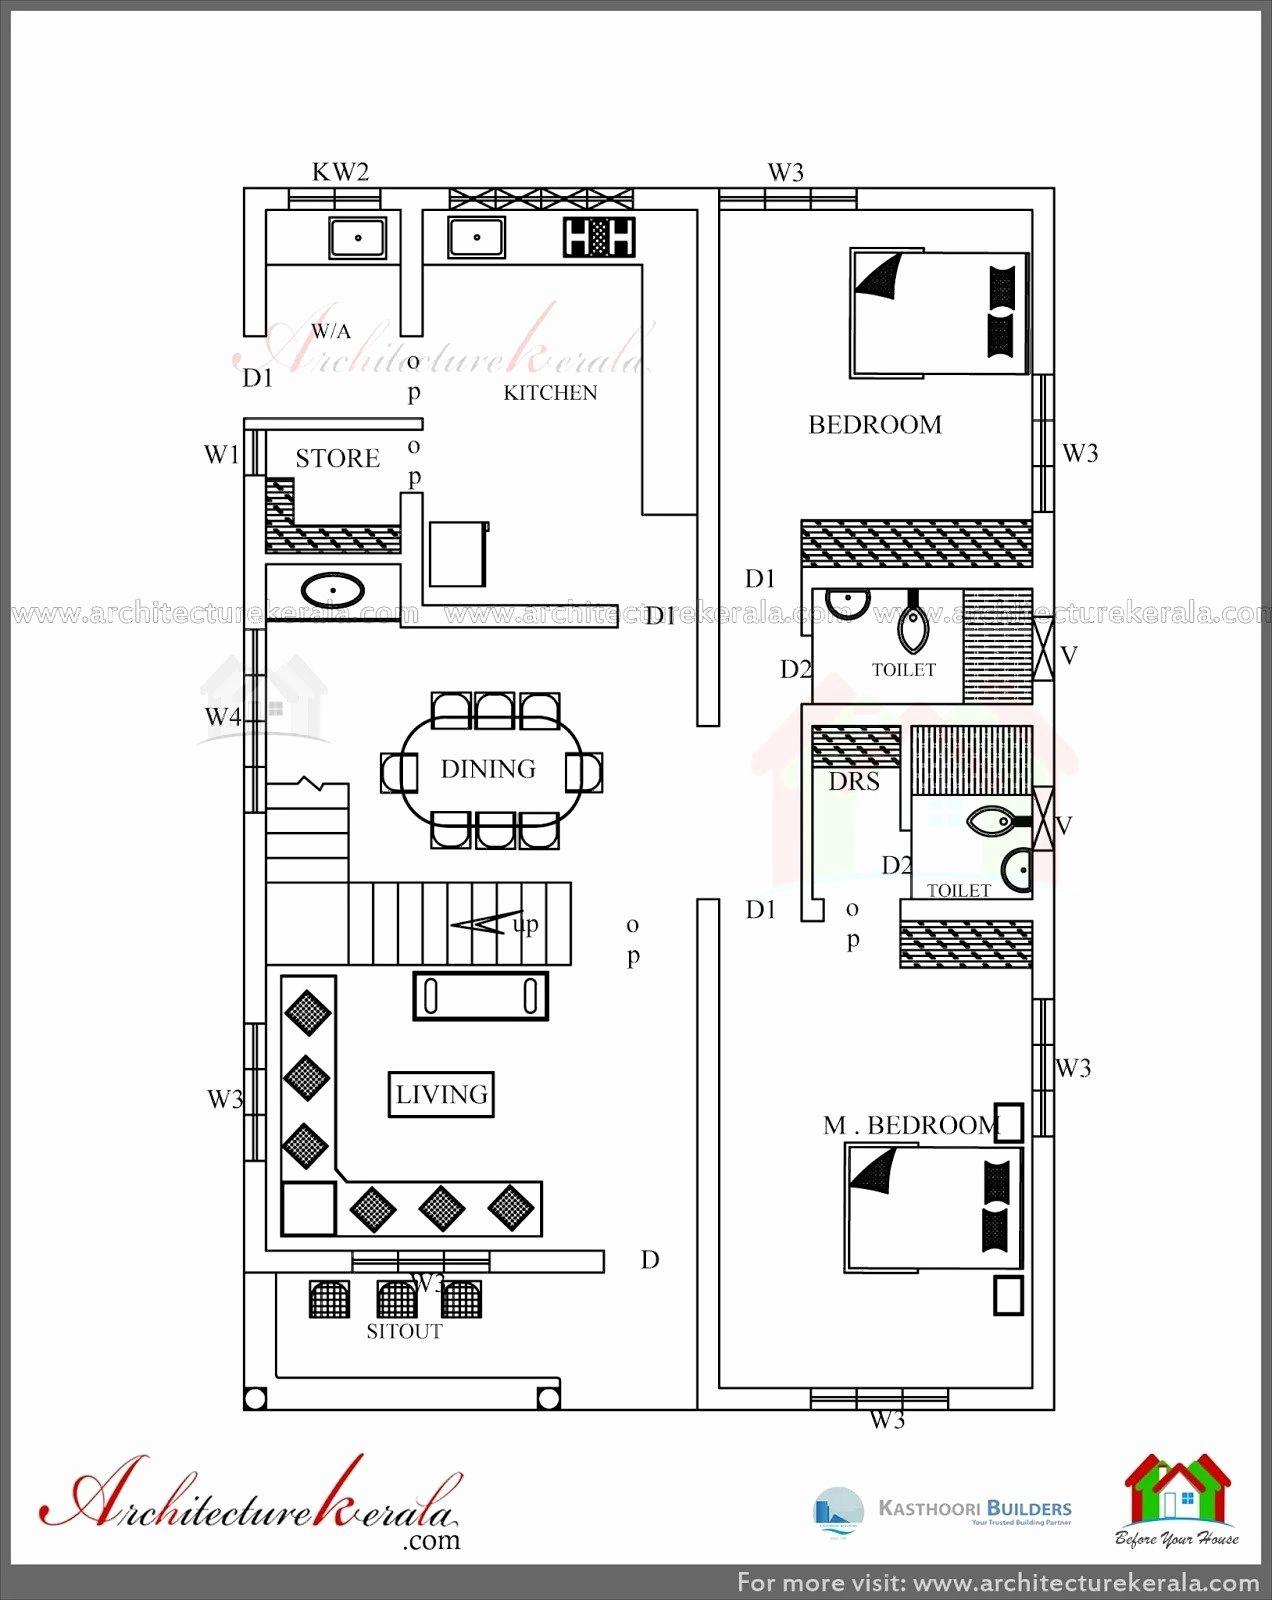 Best 20 Metal Barndominium Floor Plans For Your Dreams Home By John Martono Barndominium F Home Design Floor Plans 1200 Sq Ft House Barndominium Floor Plans